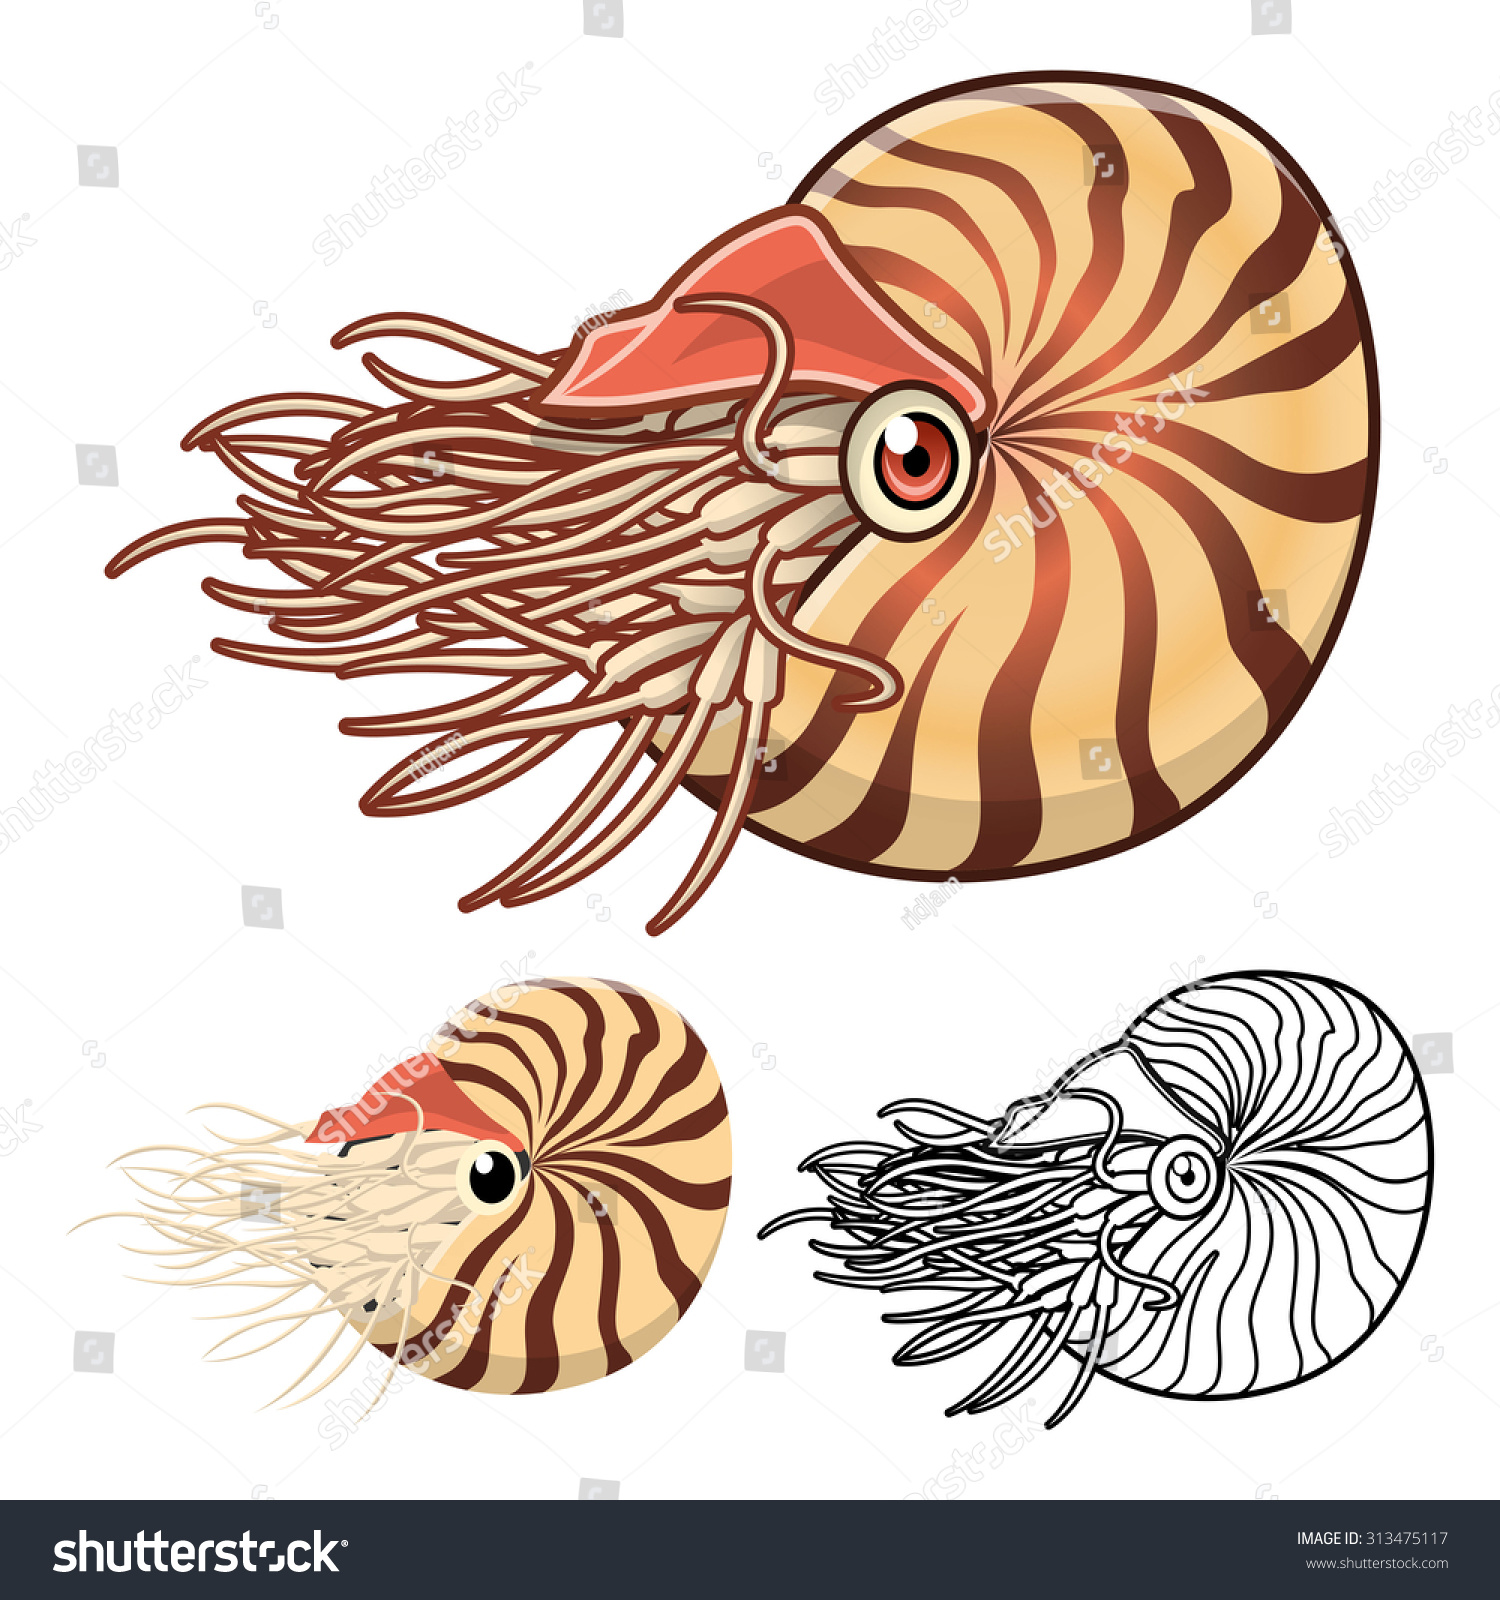 Line Art Nautilus : High quality nautilus cartoon character include stock